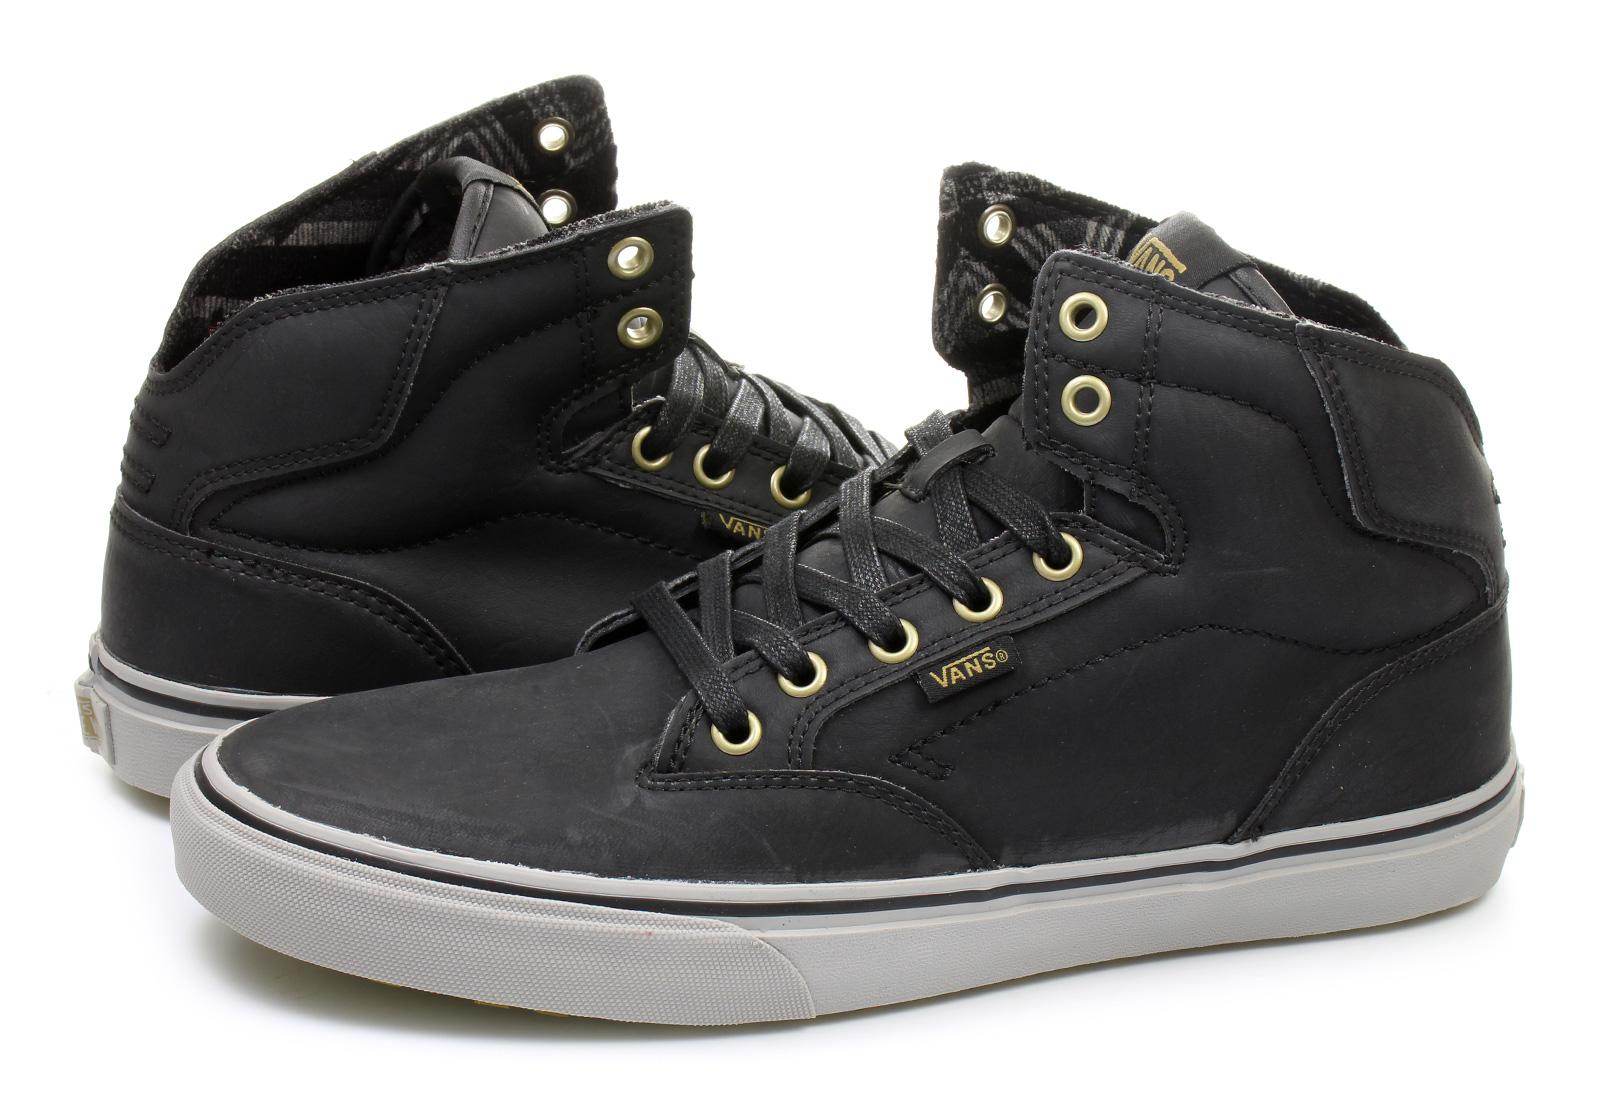 Vans Shoes - Winston Hi Mte - V00348K7D - Online shop for sneakers ... b6b78e5aa4